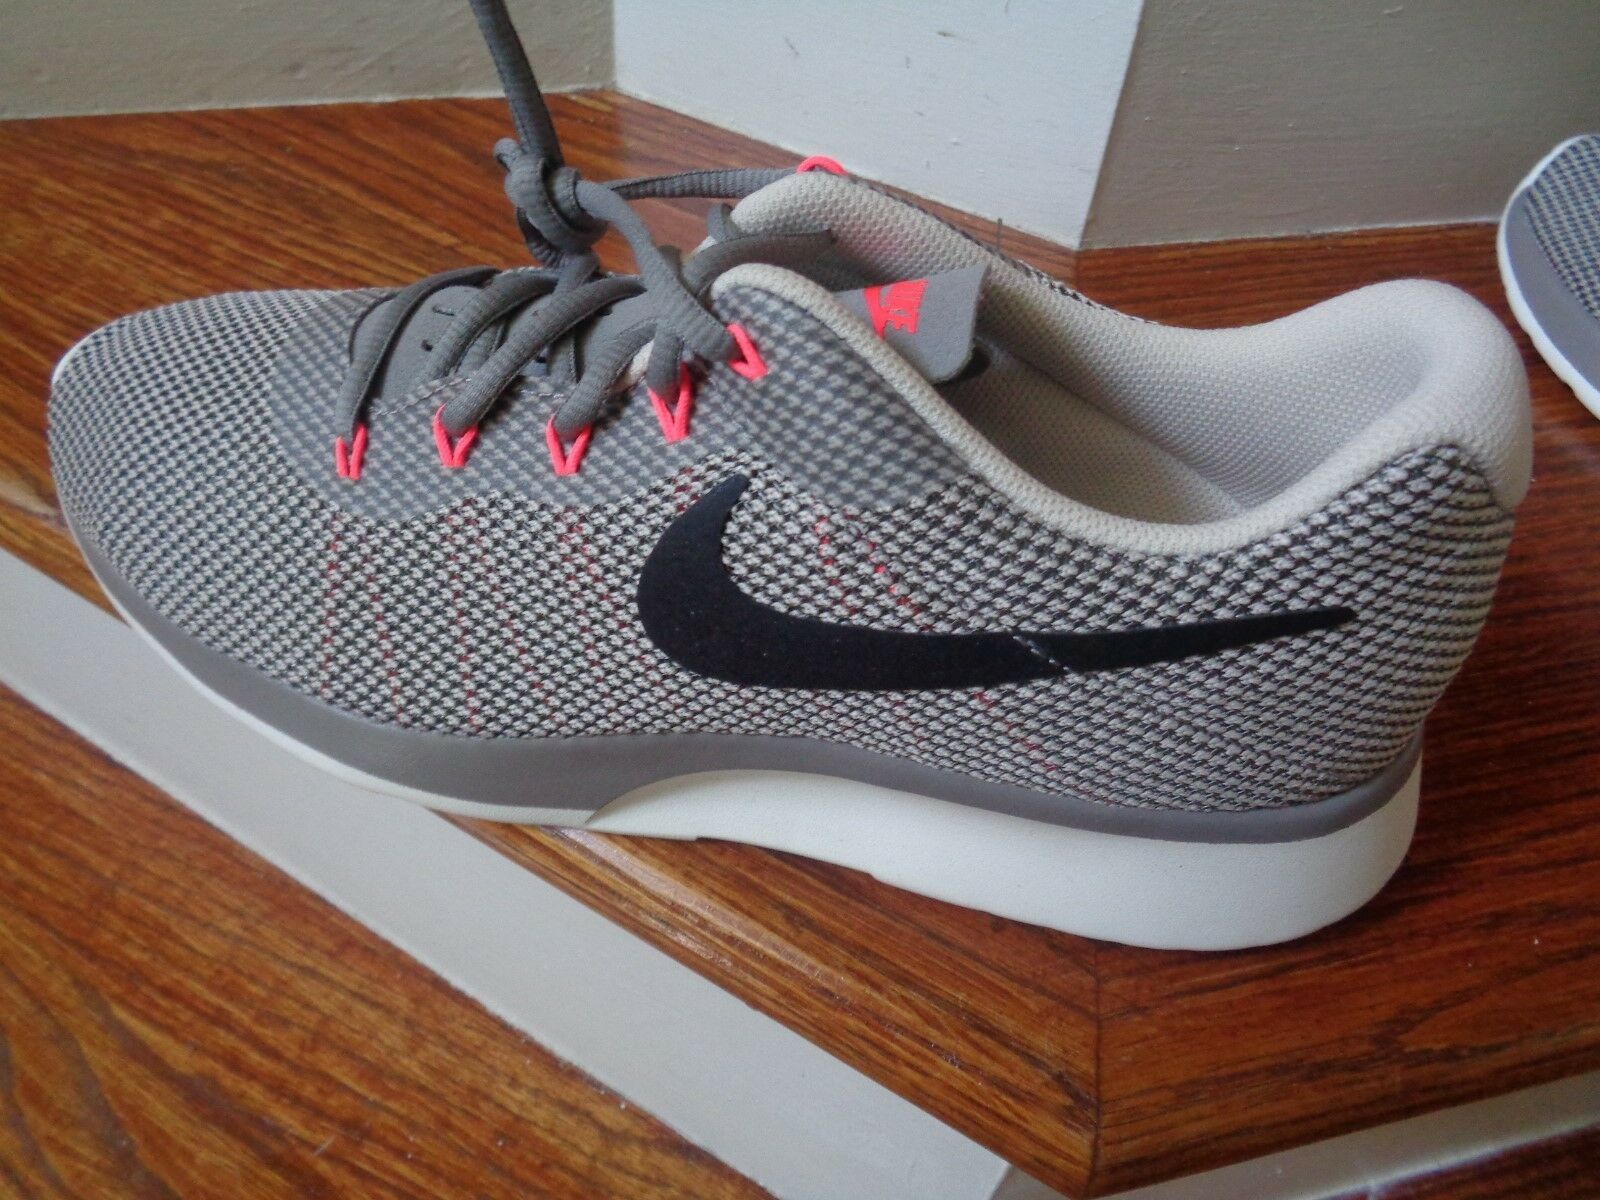 Nike Tanjun Racer Men's Running Shoes, 921669 003 Size 10 NEW